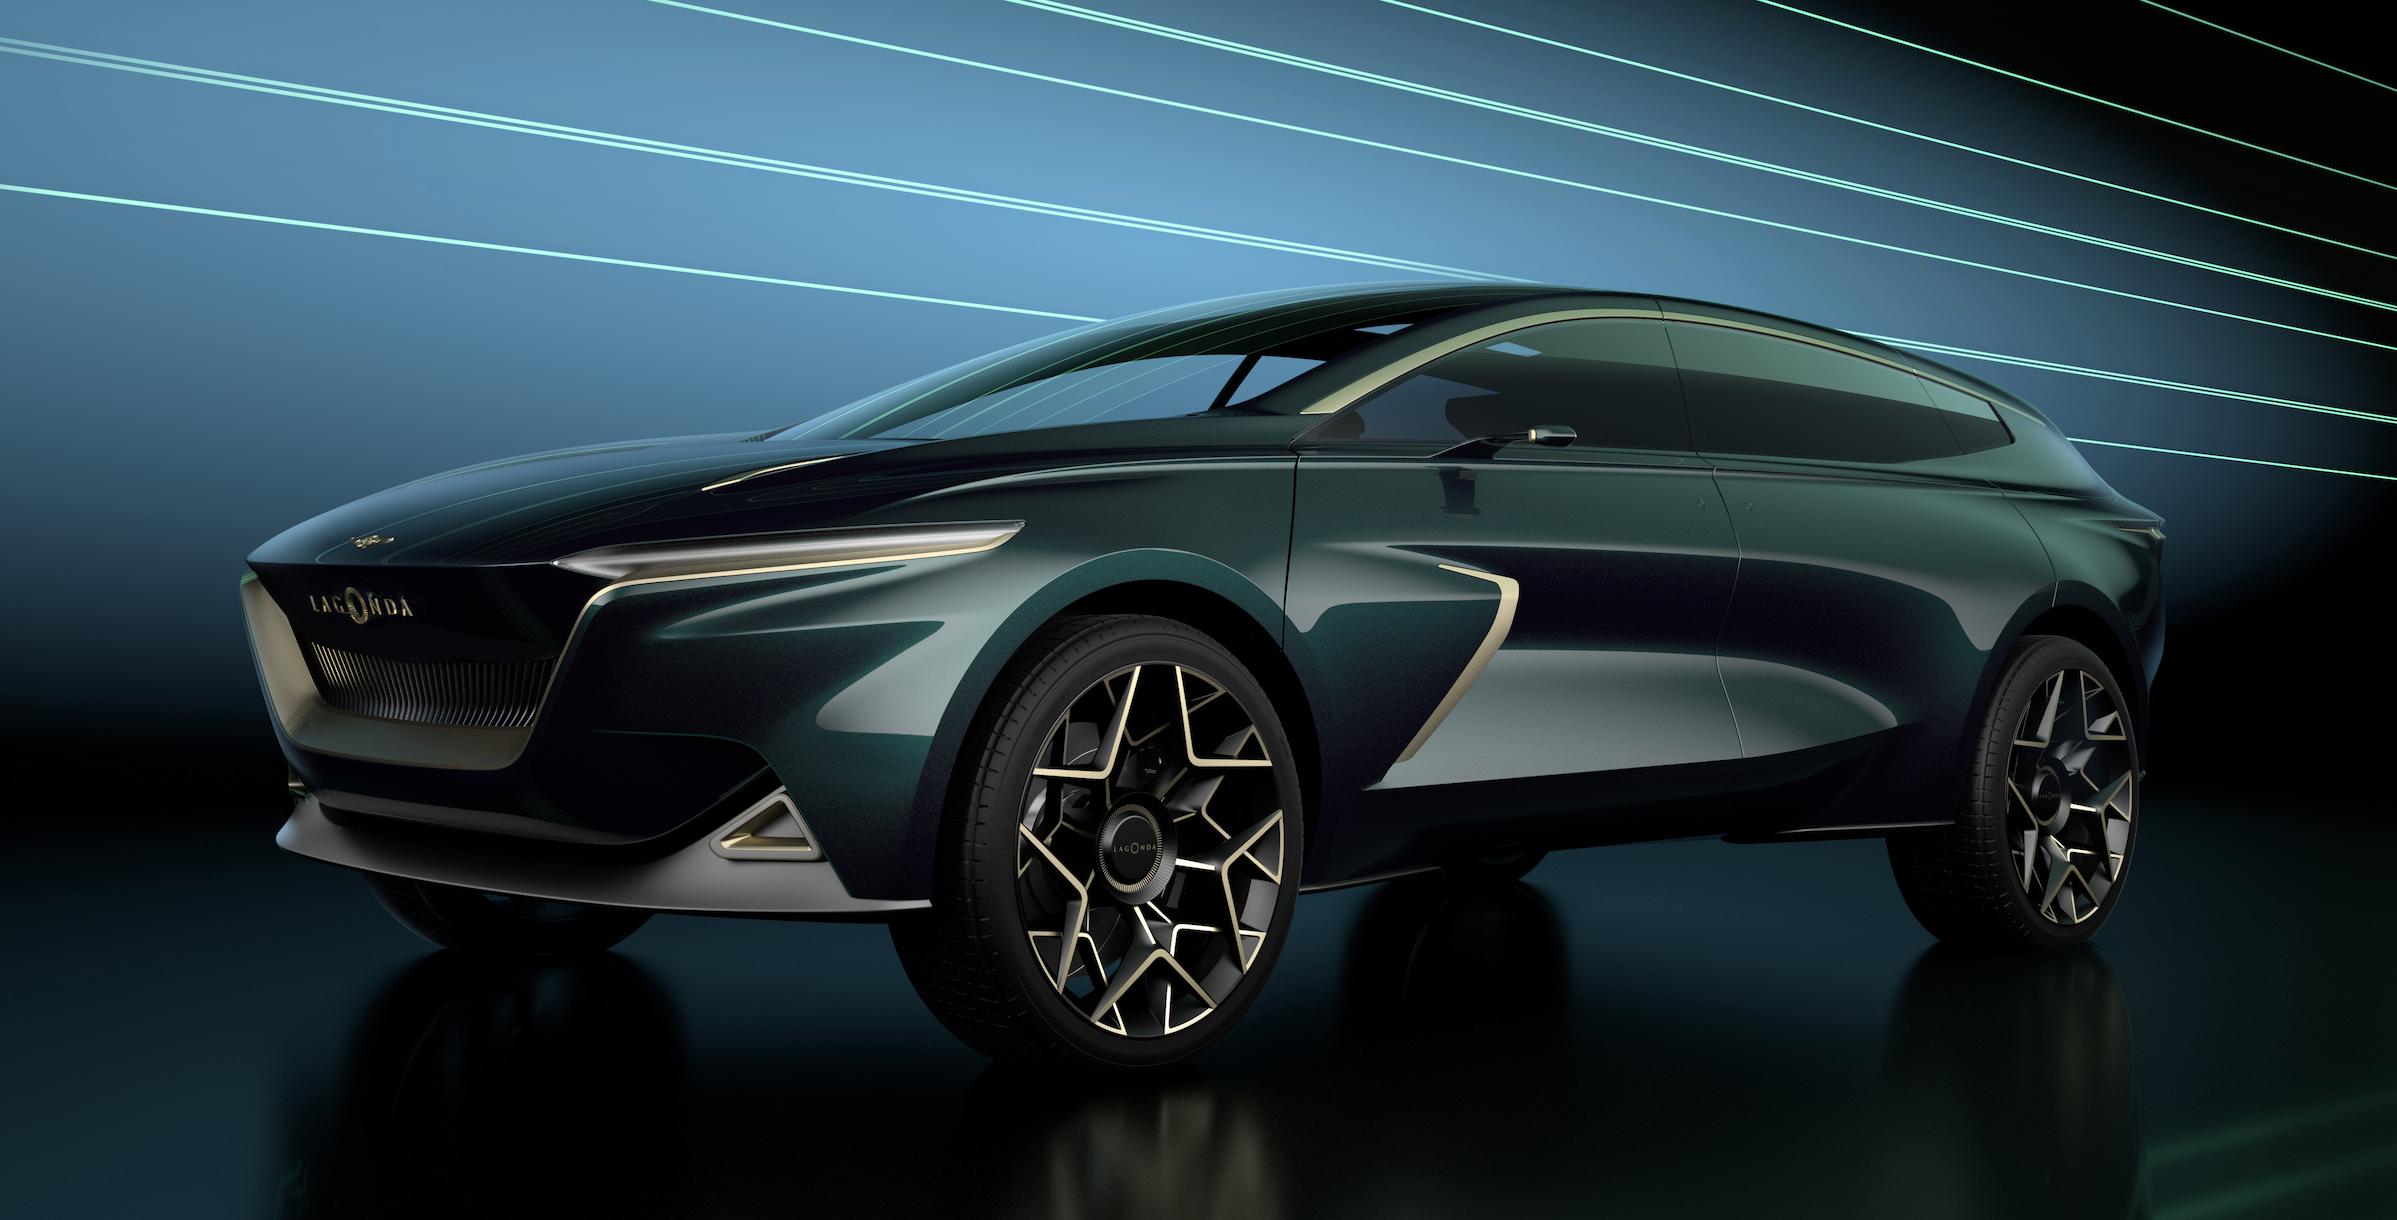 The Lagonda All-Terrain Concept, a long and sleek ultra-luxury SUV.